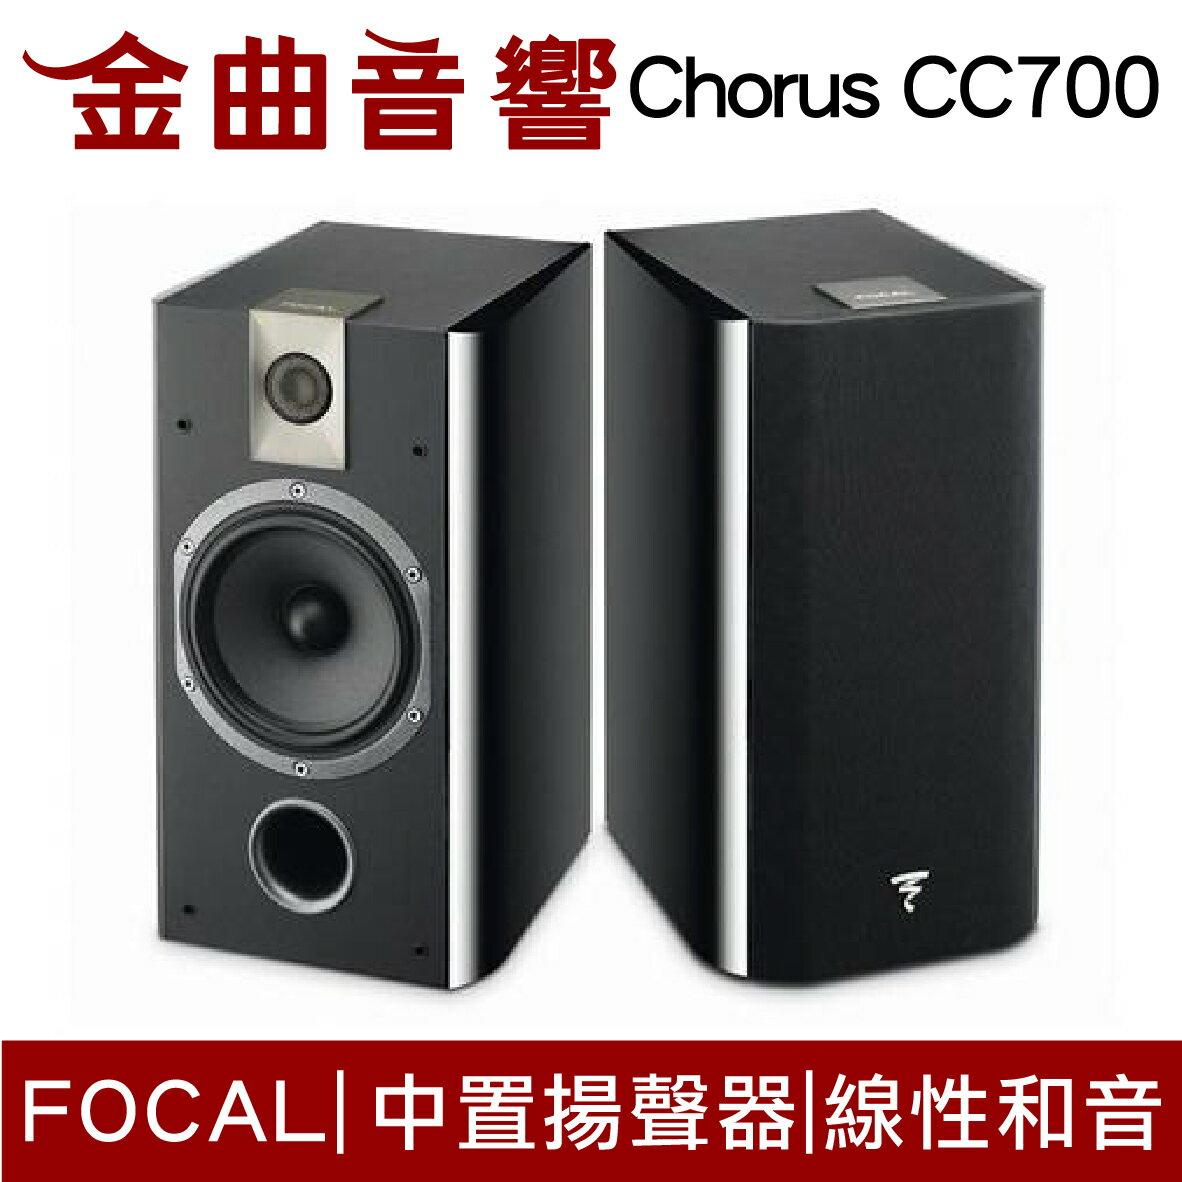 FOCAL Chorus 705 多色 書架式 揚聲器 喇叭 音響(一對)| 金曲音響